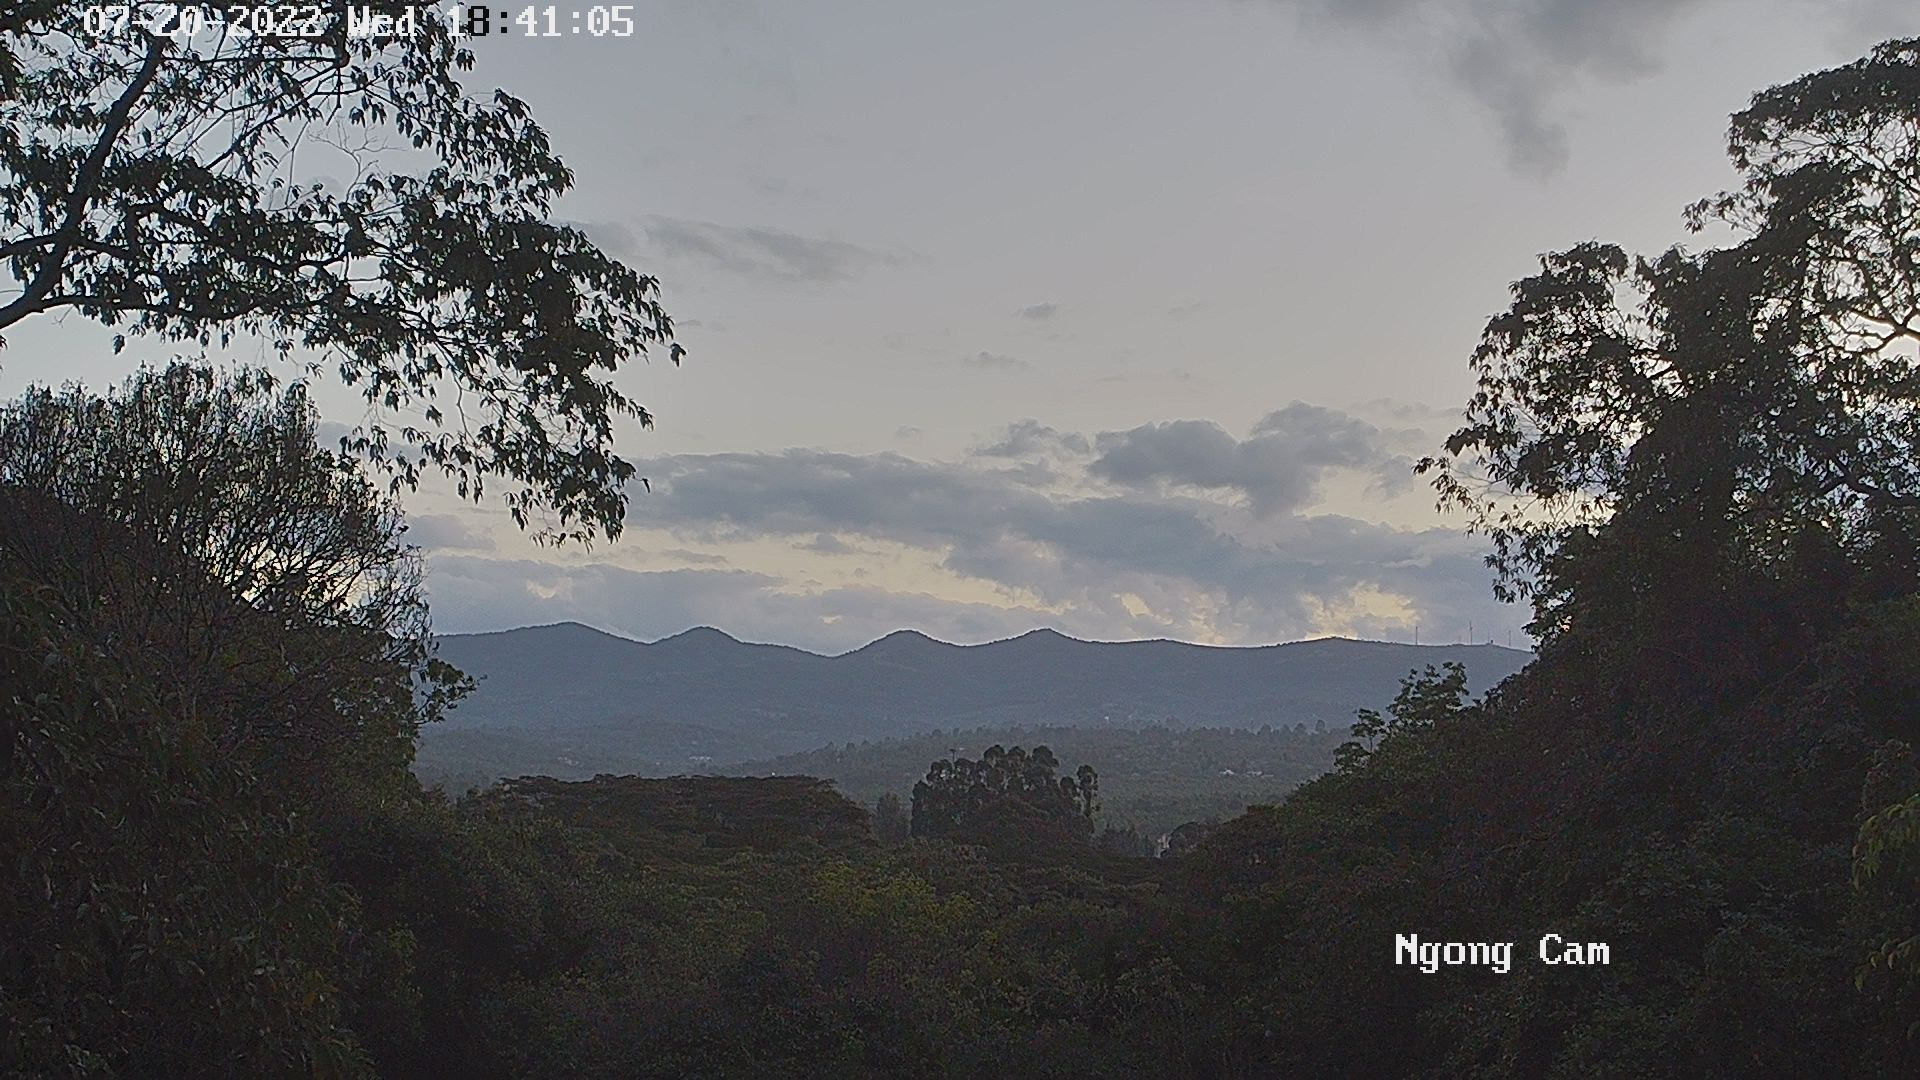 Mount Longonot Mi. 18:47